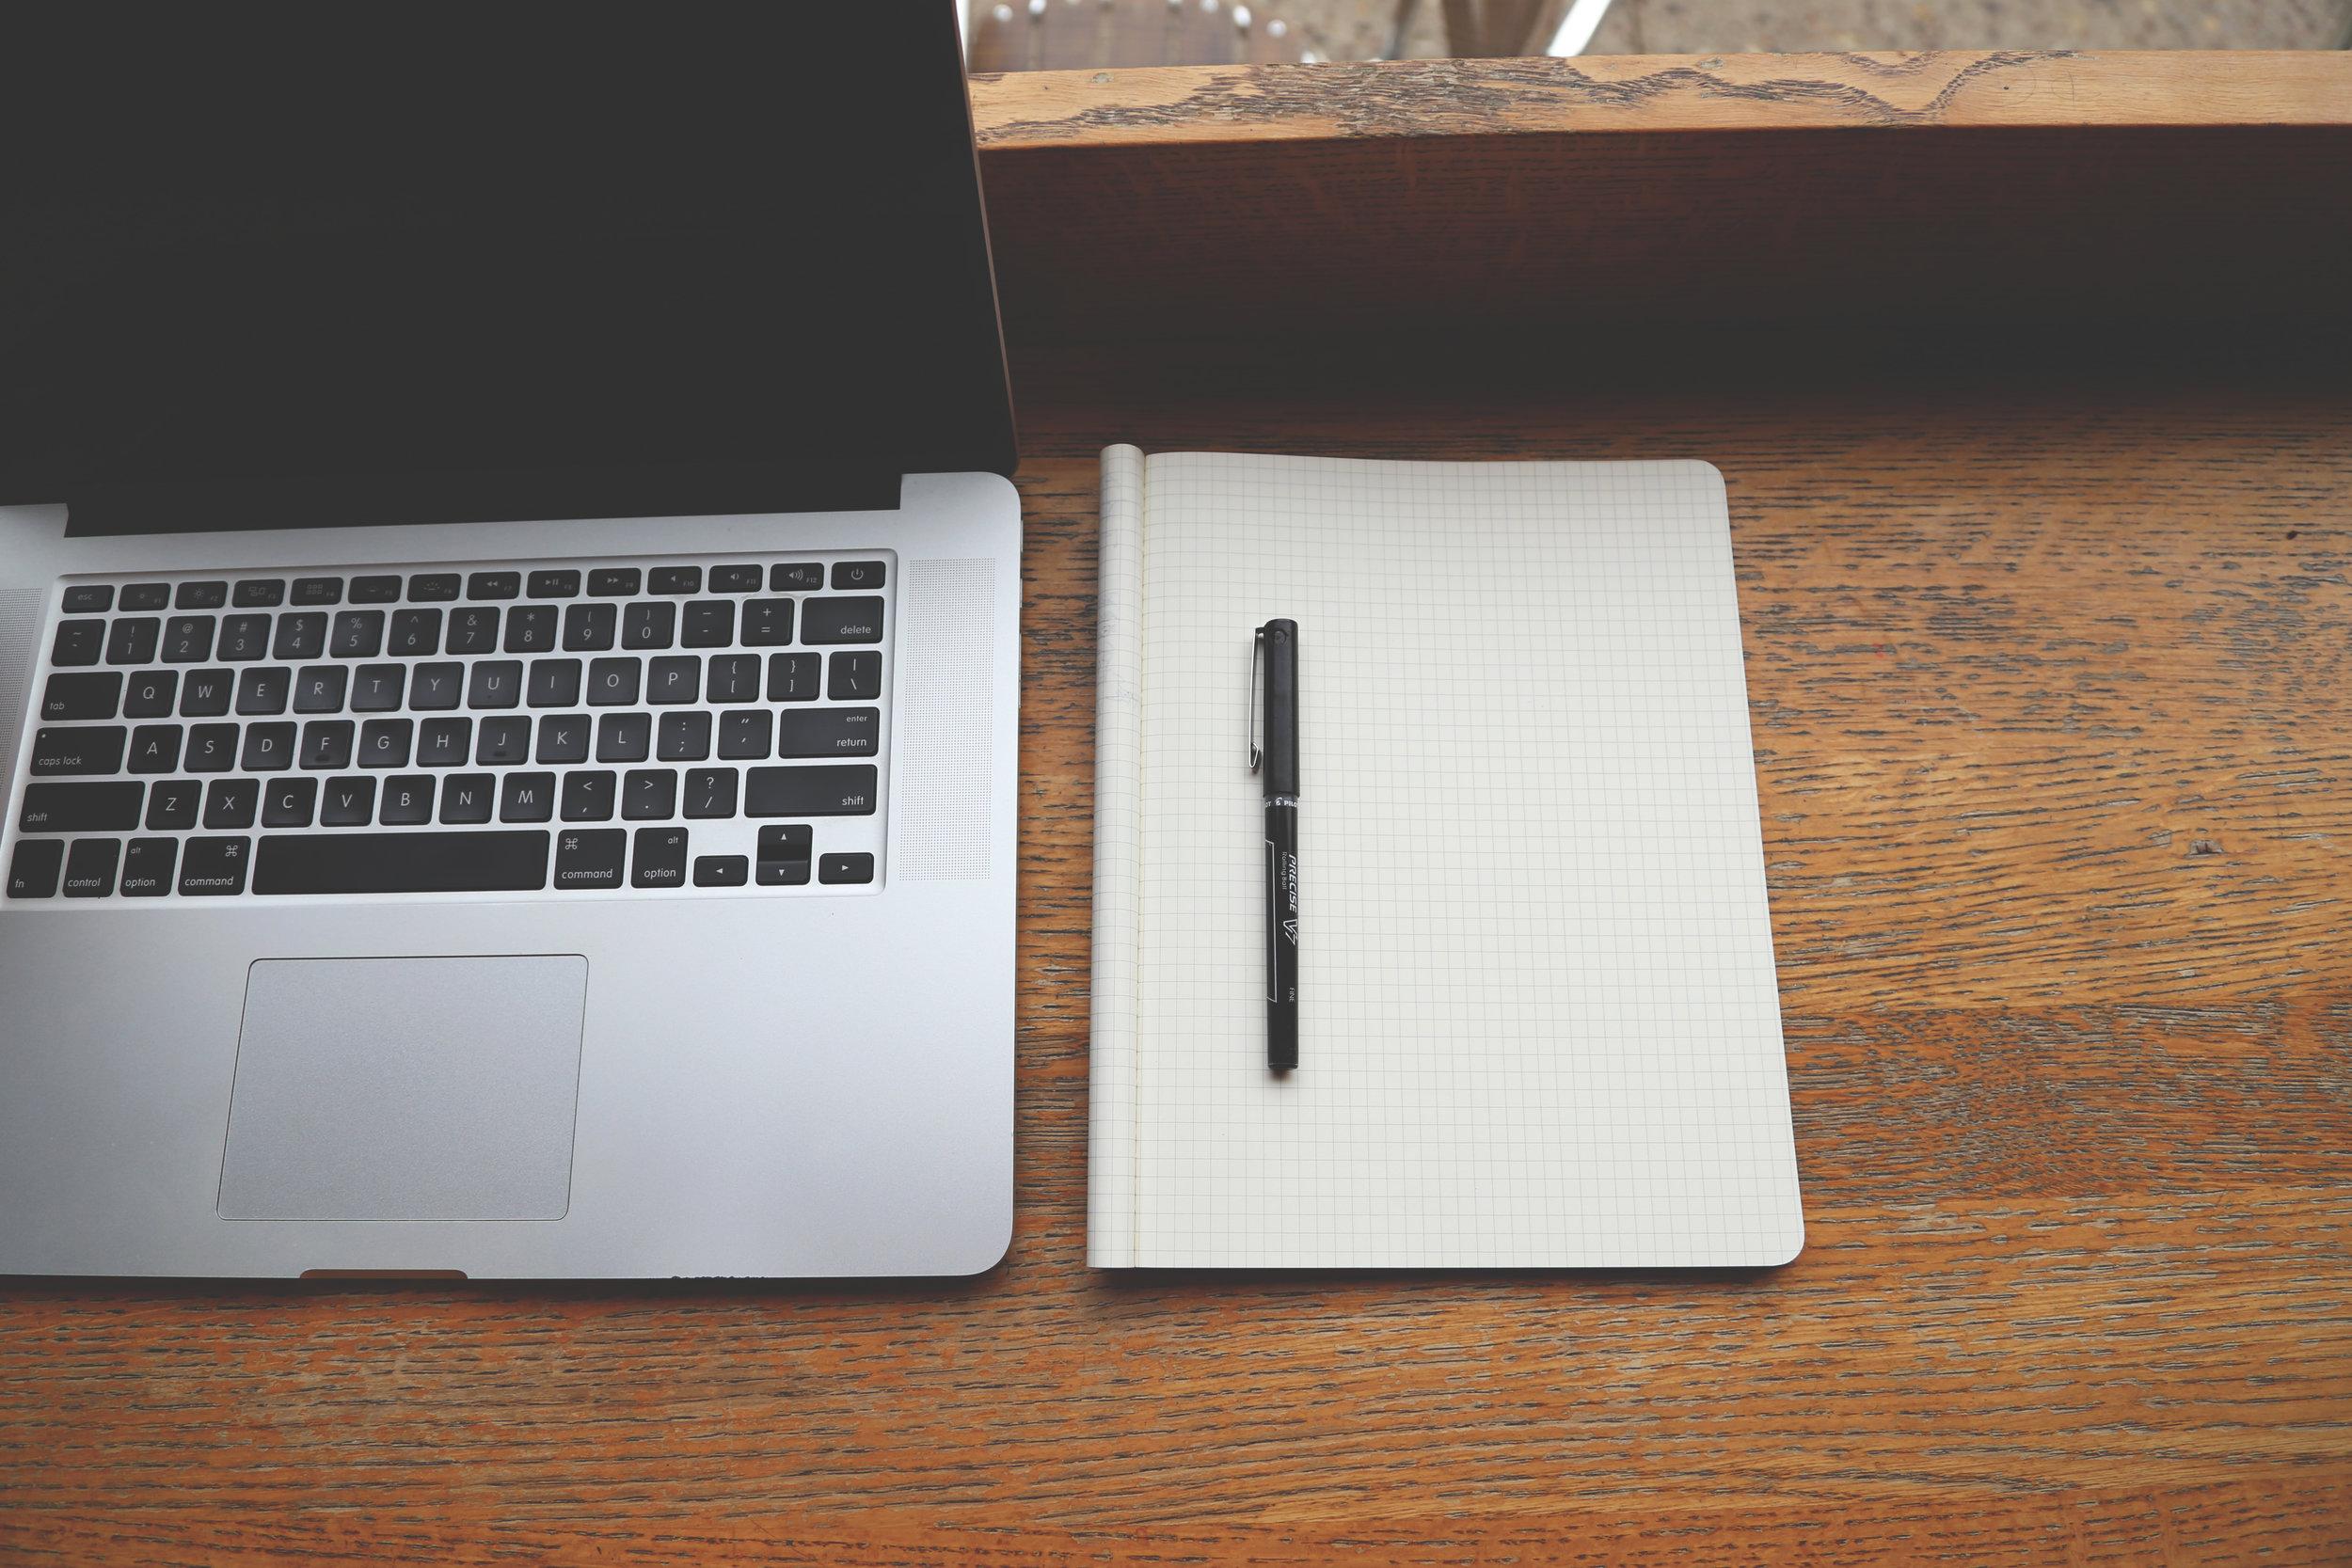 Mac and notebook.jpg